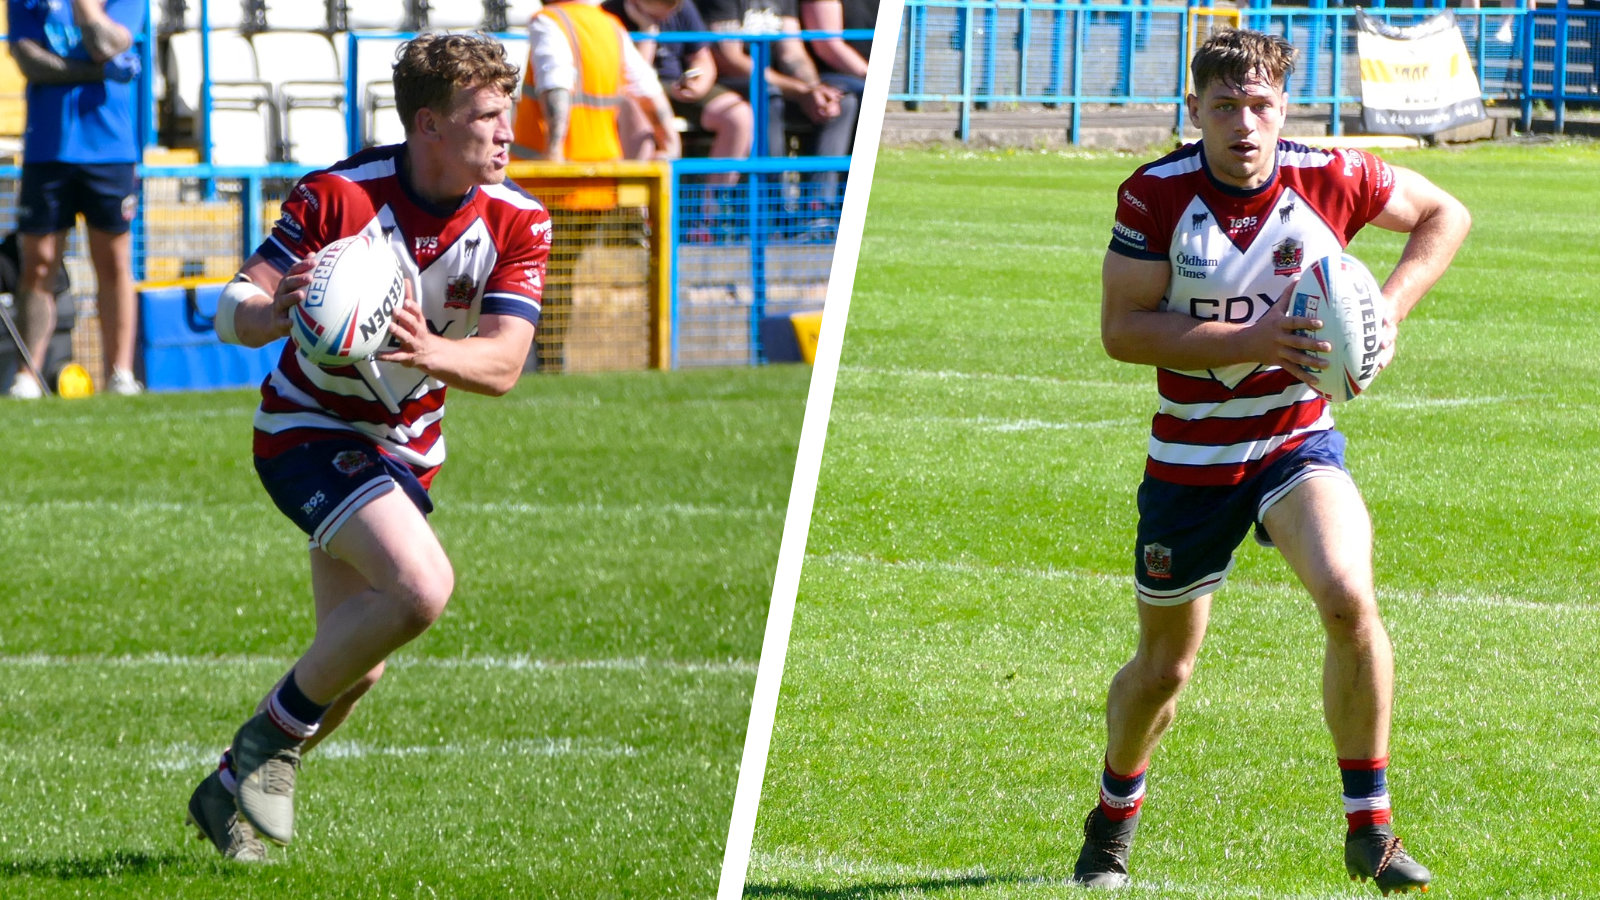 Gareth Owen and Liam Bent